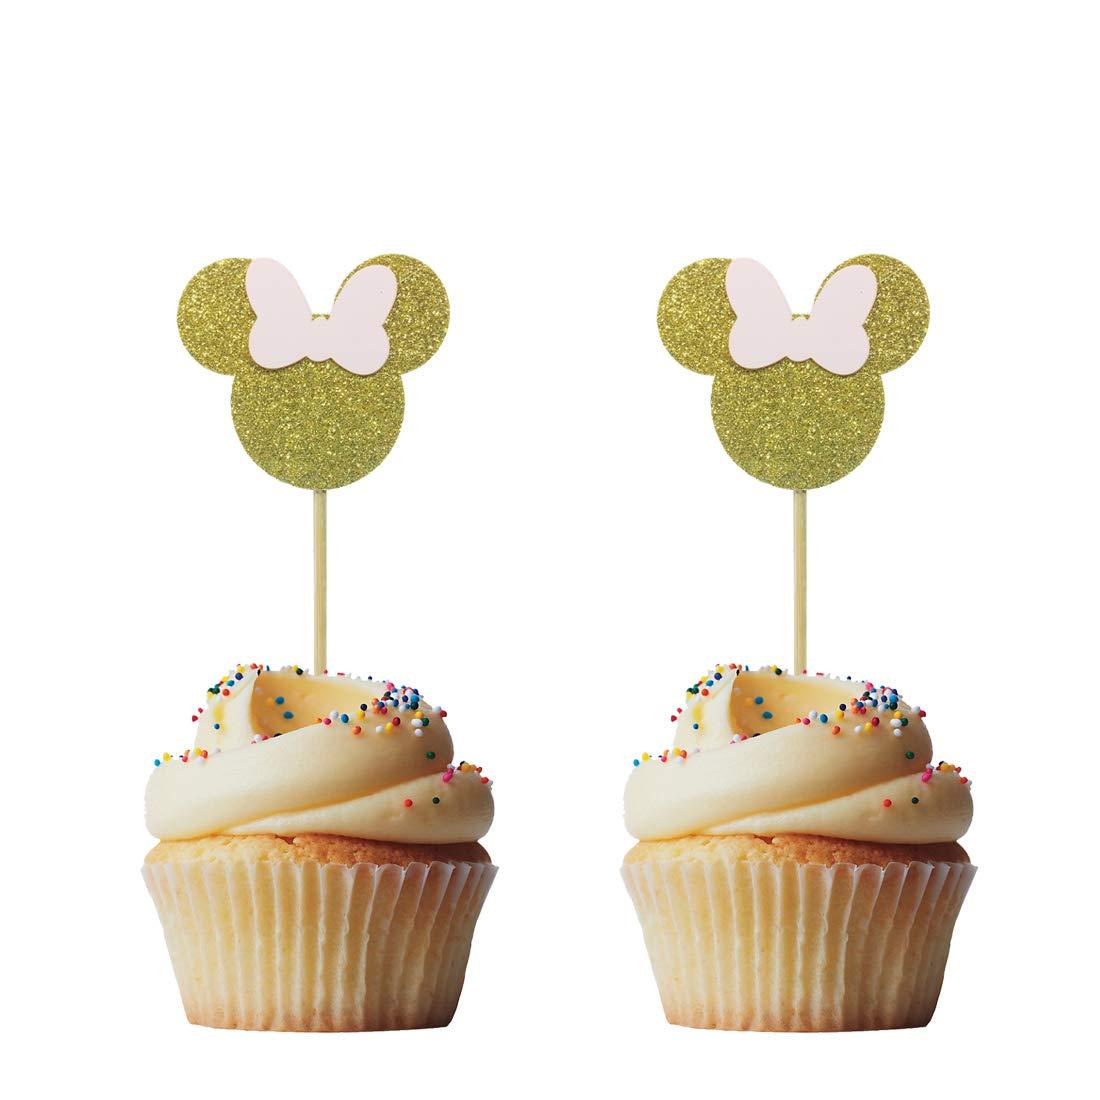 GRAND MICKEY MOUSE oreilles De Noël Fête Anniversaire Cup Cake Toppers Pick Silver Glitter